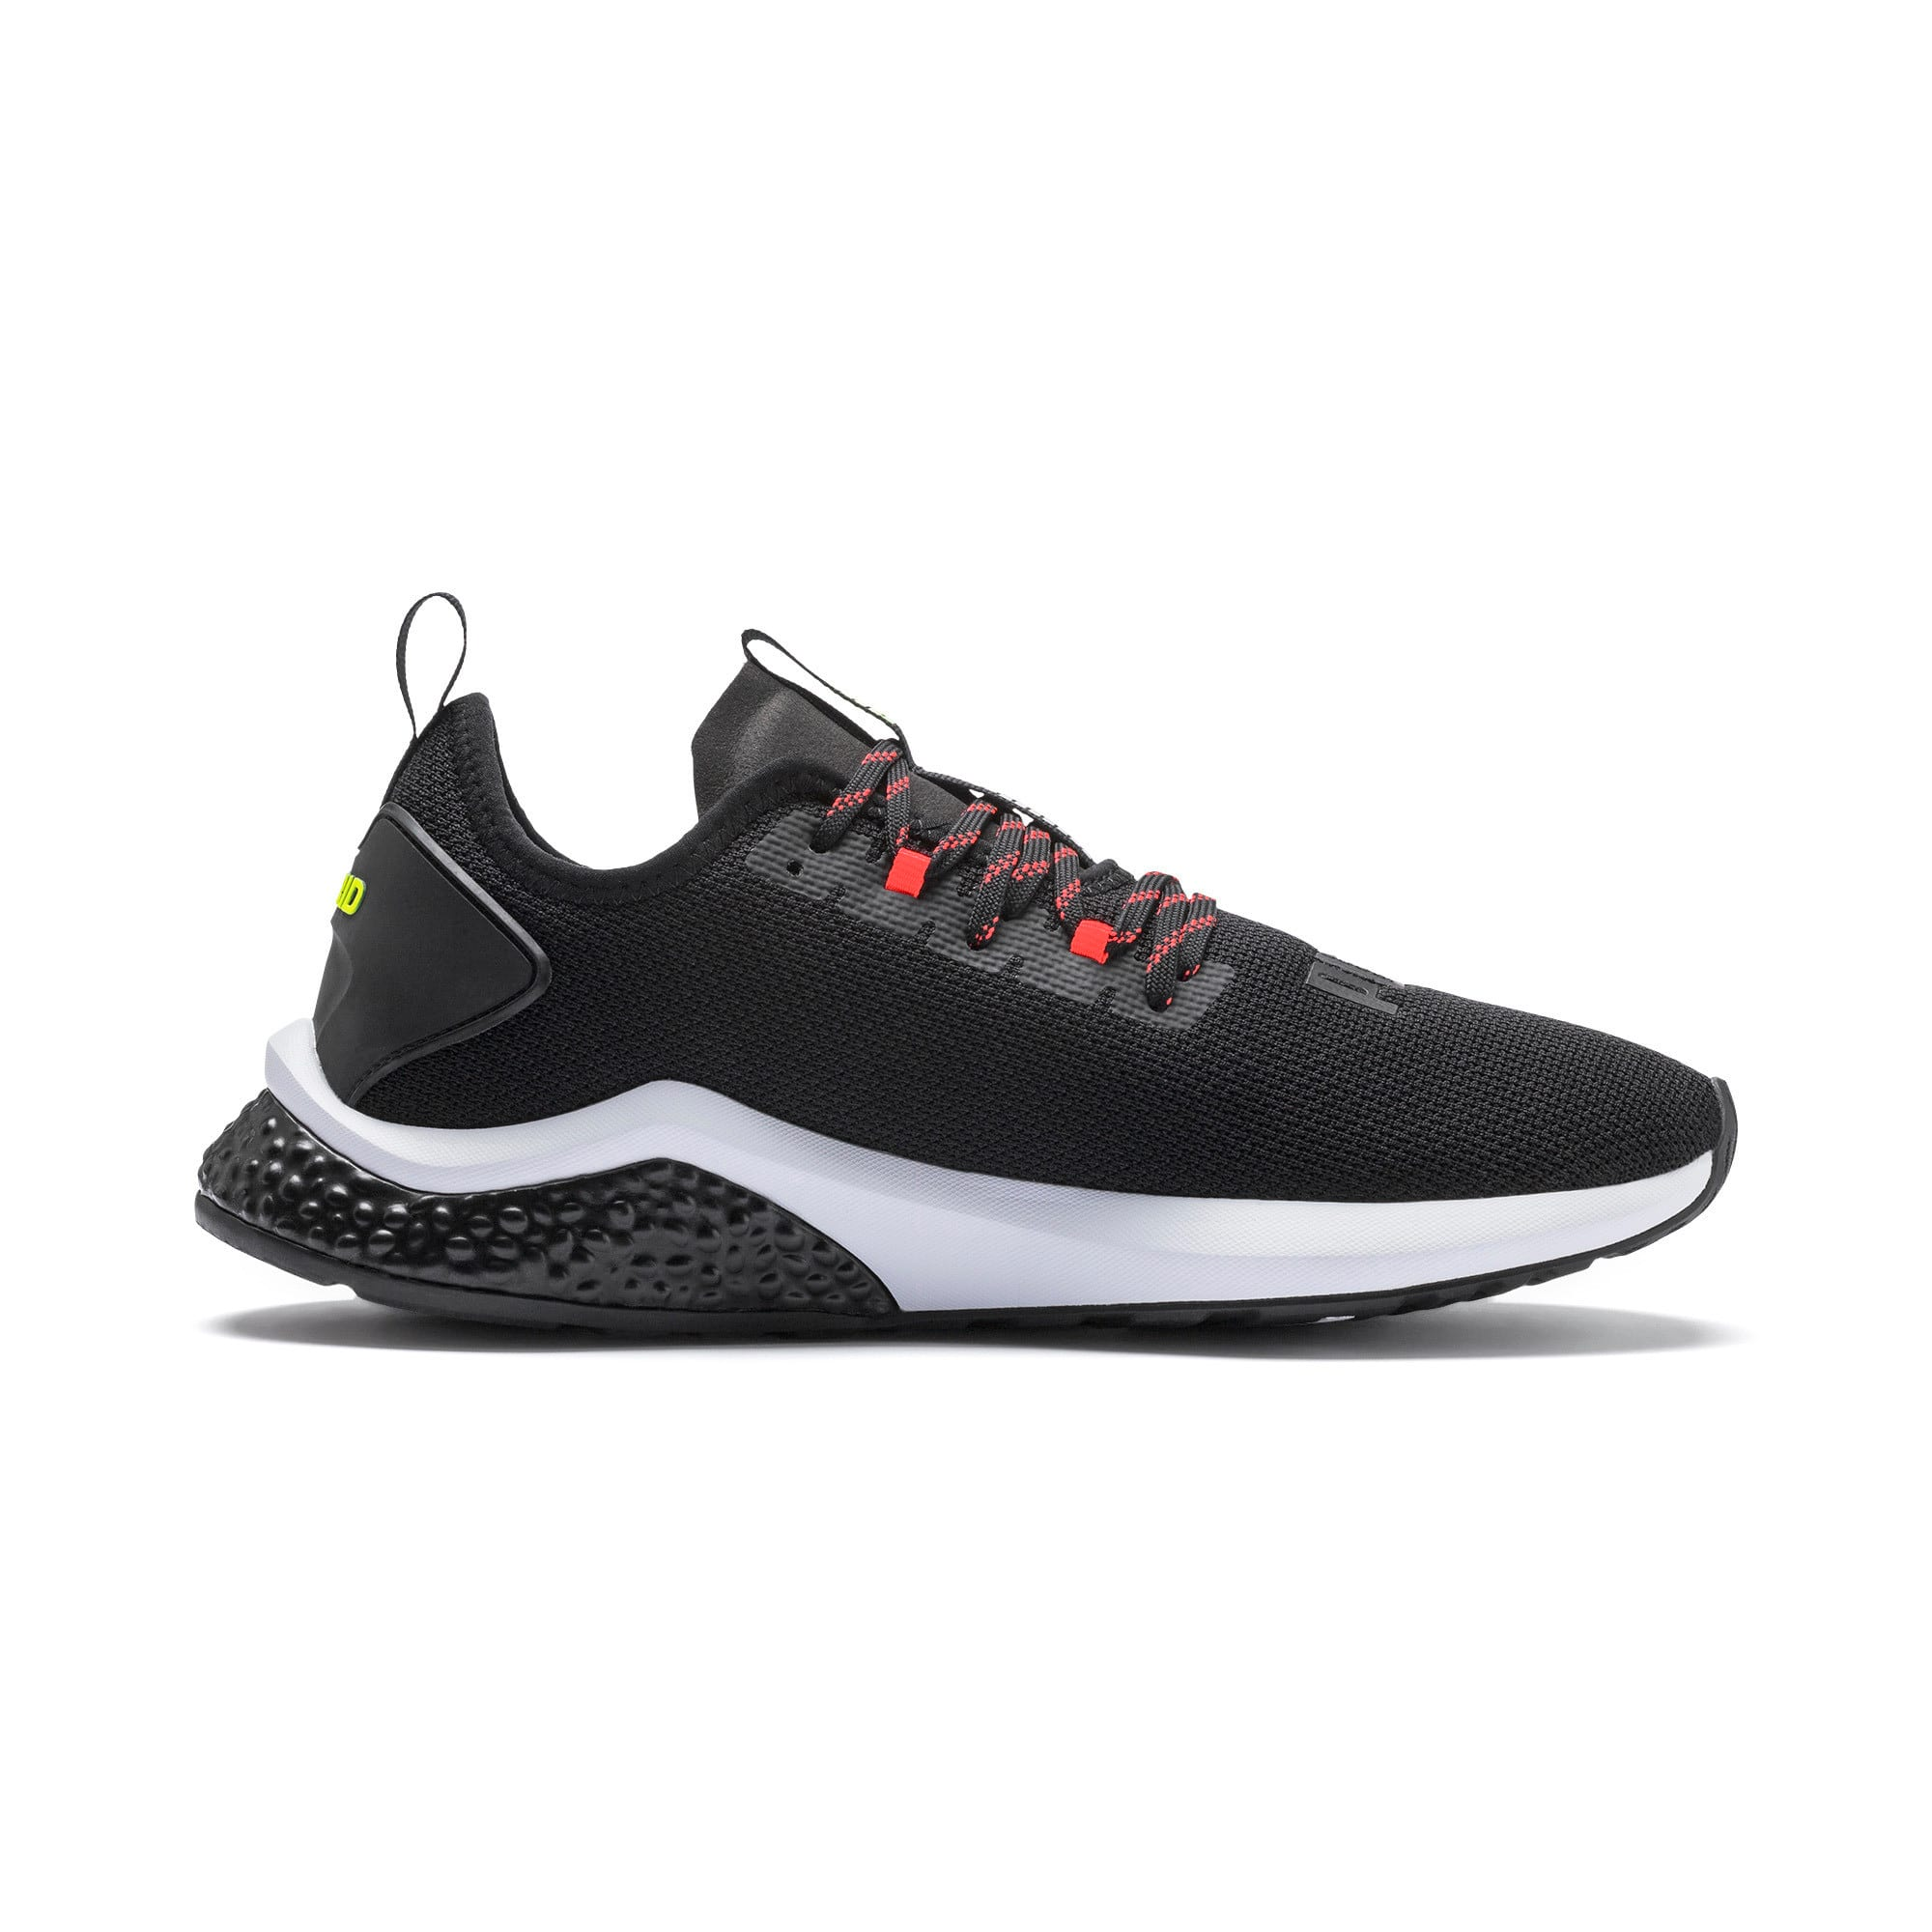 Thumbnail 6 of HYBRID NX Men's Running Shoes, Black-Nrgy Red-Yellow Alert, medium